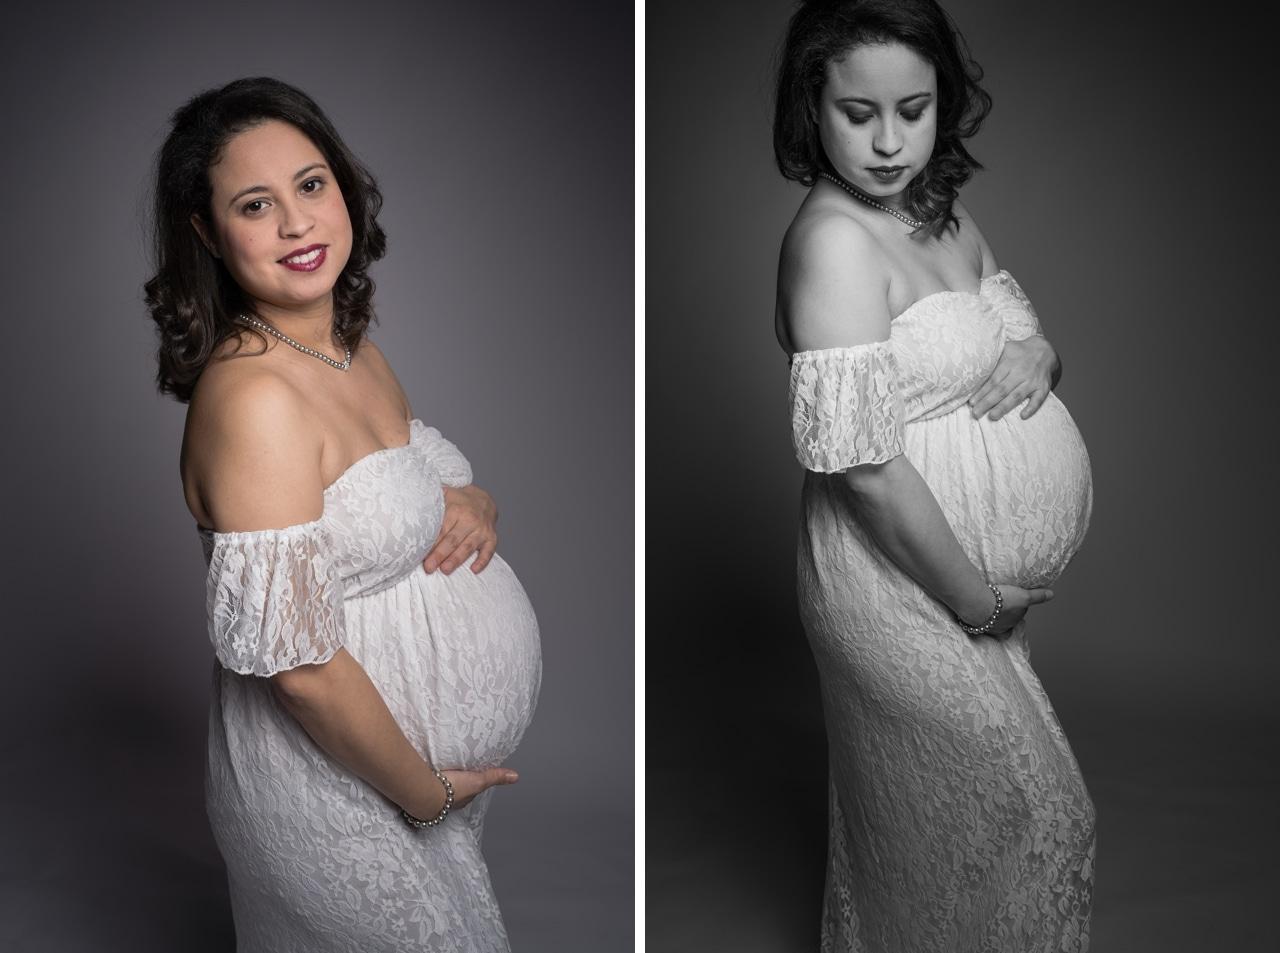 seance-grossesse-mons-belgique-25